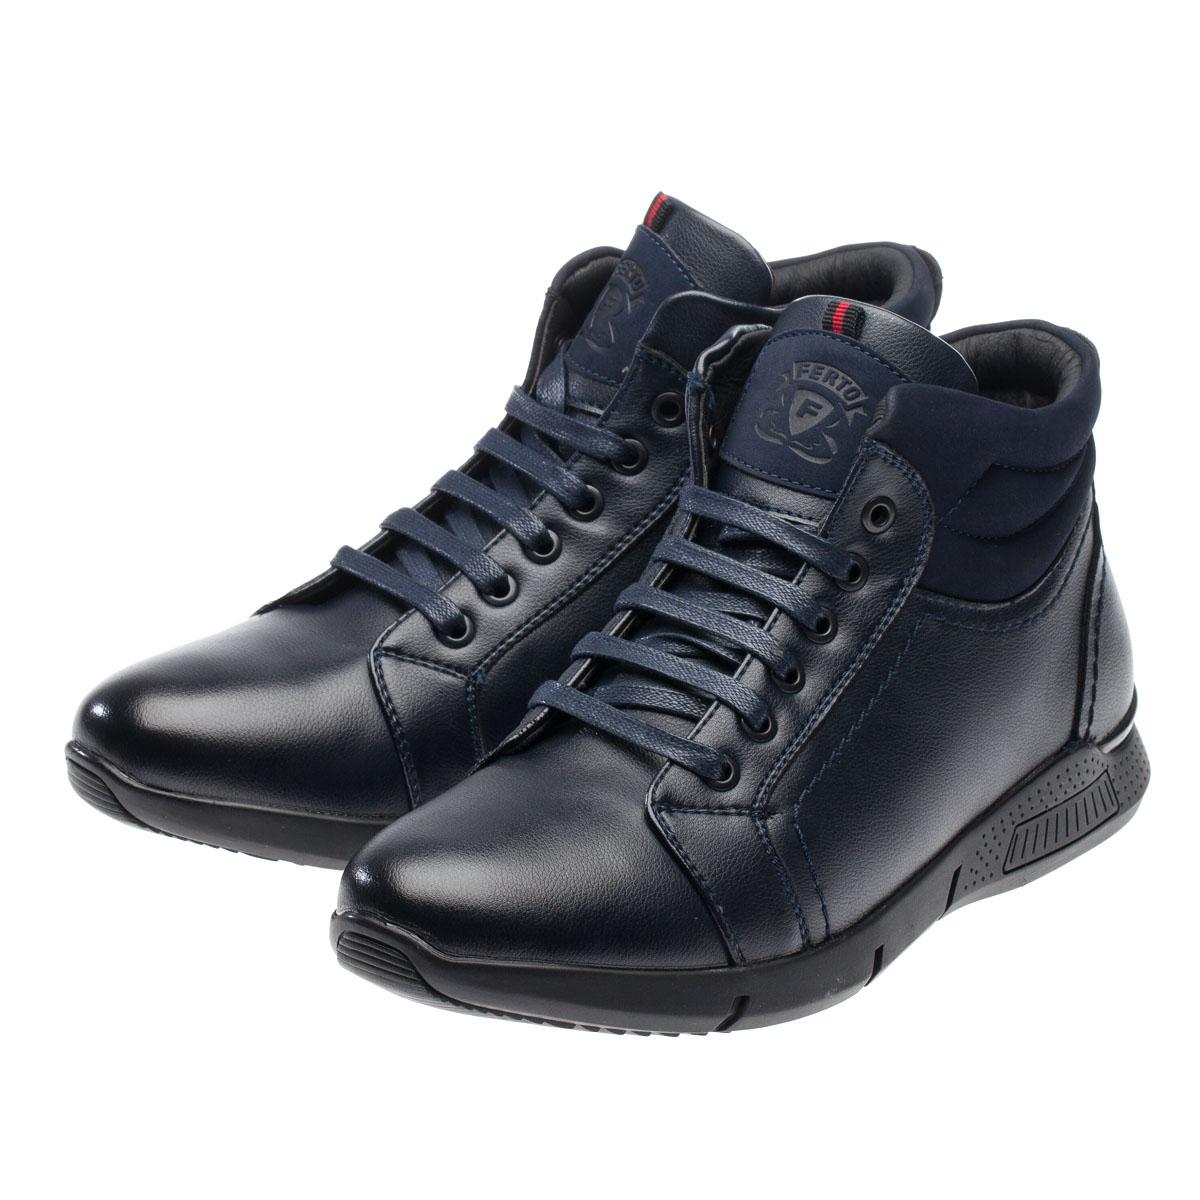 Ботинки зимние FERTO, M628-1